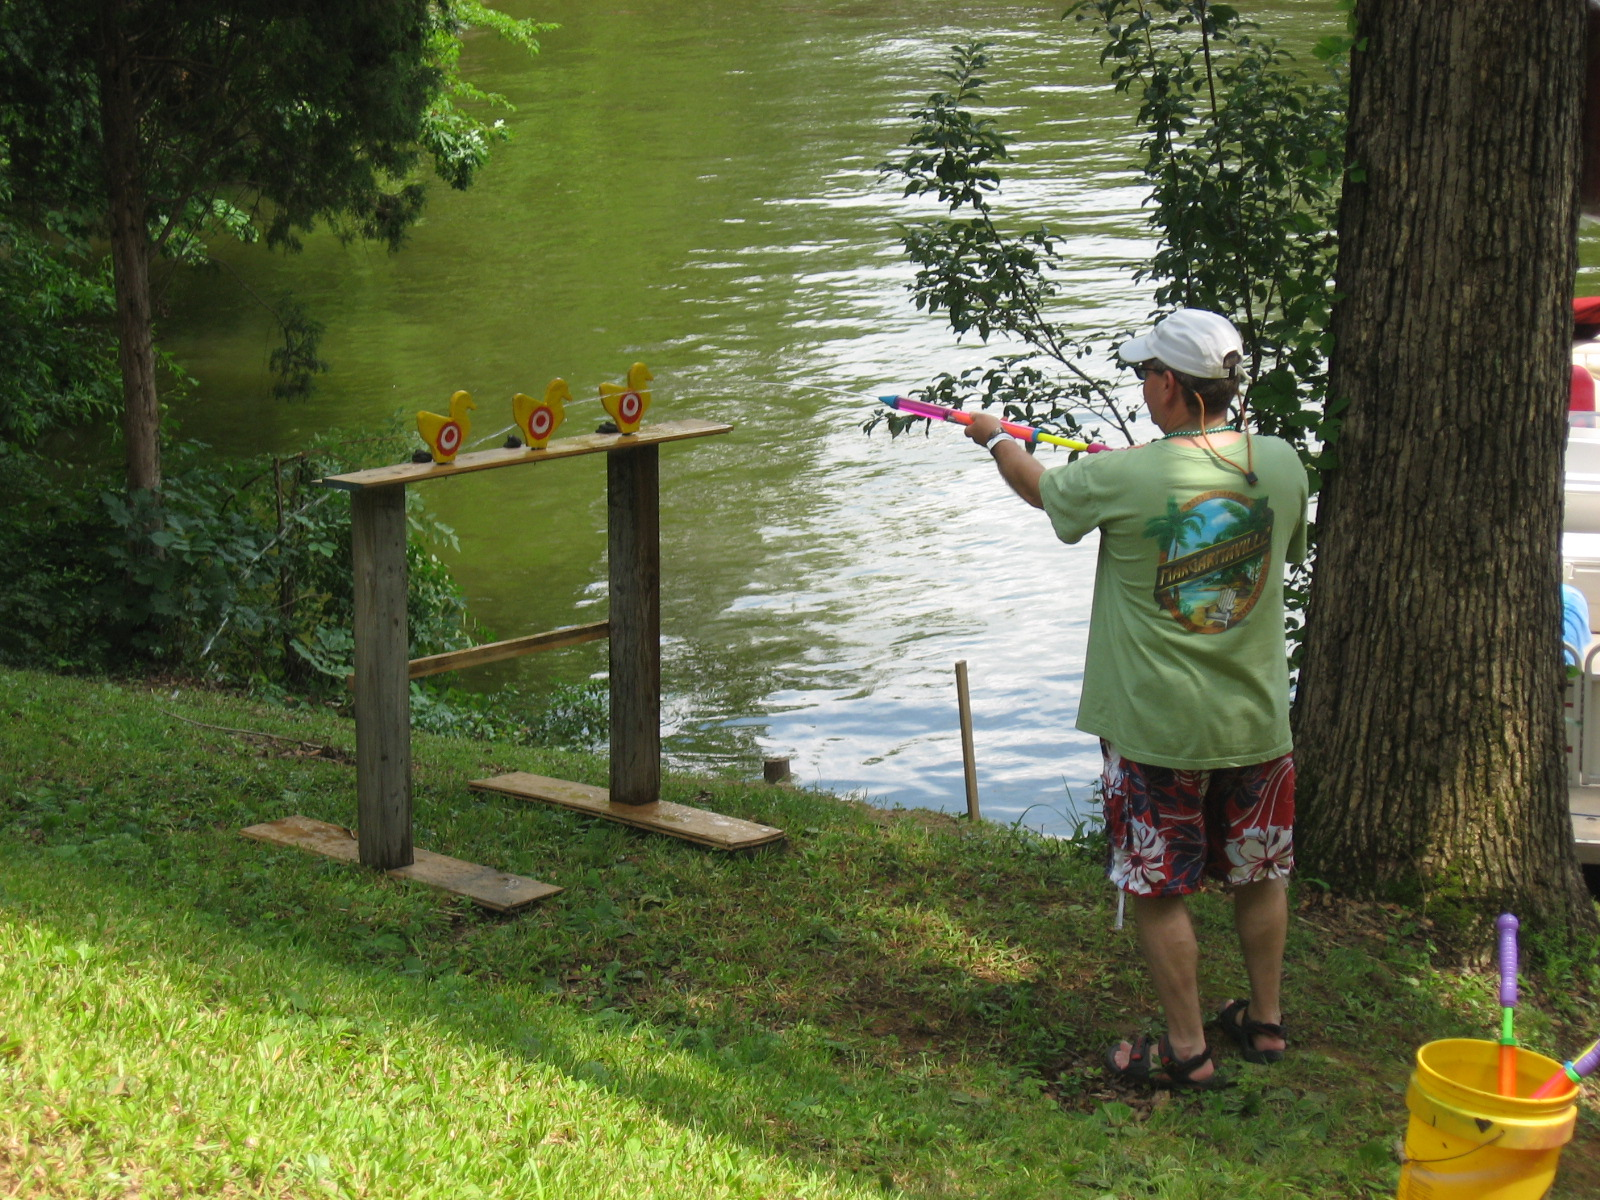 DUCK DYNASTY - BRYAN SHOOTING WOODEN DUCKS WITH A WATER GUN